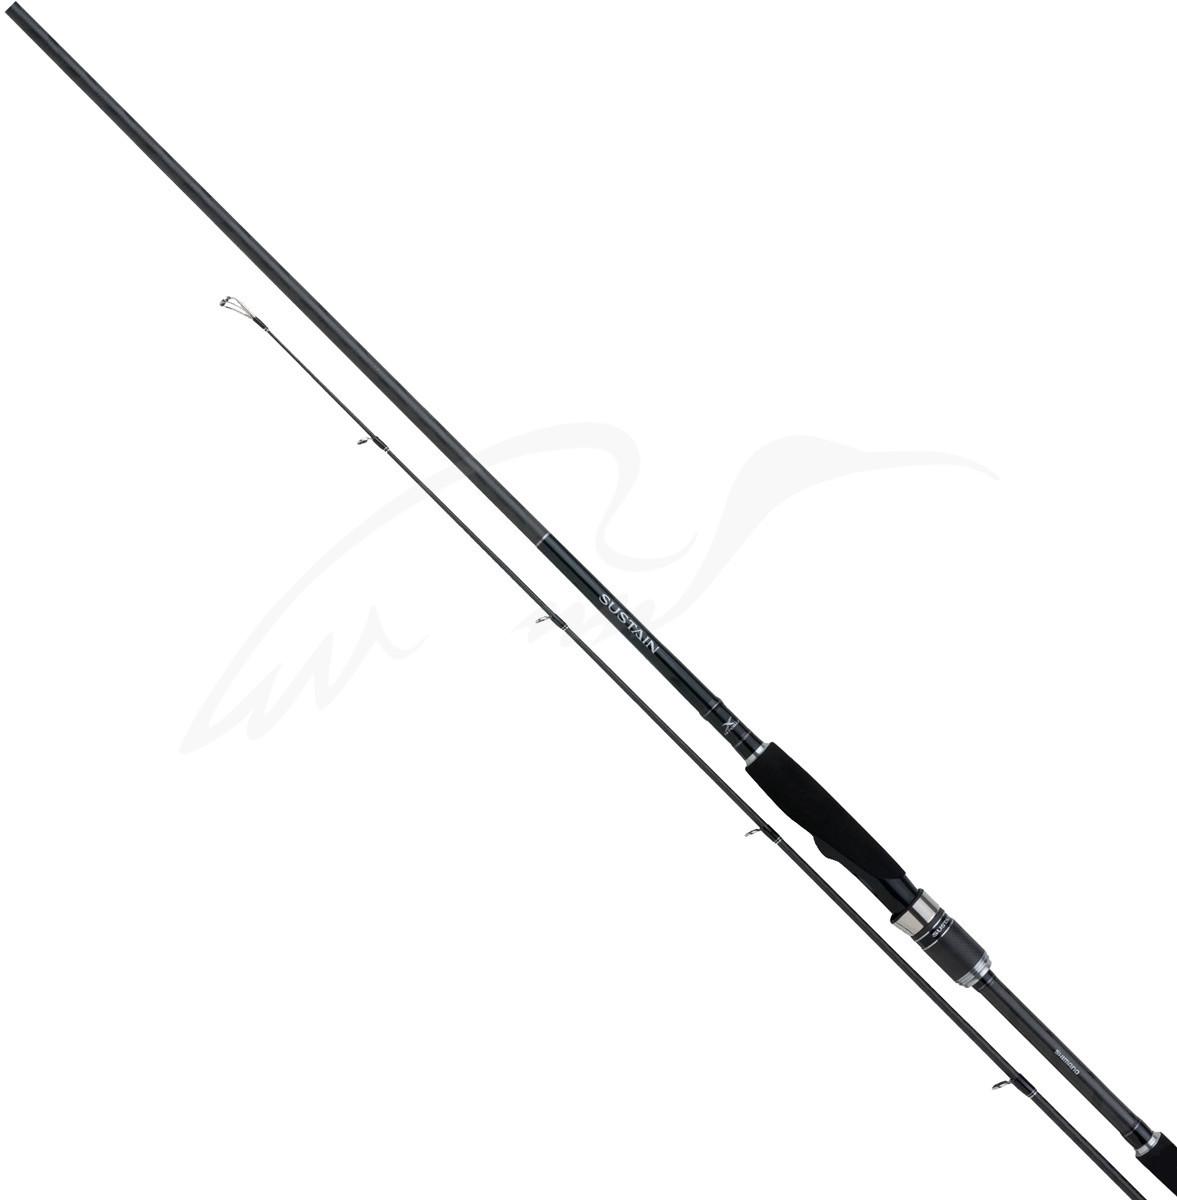 Спиннинг Shimano Sustain AX 78M 2.39m 7-35g